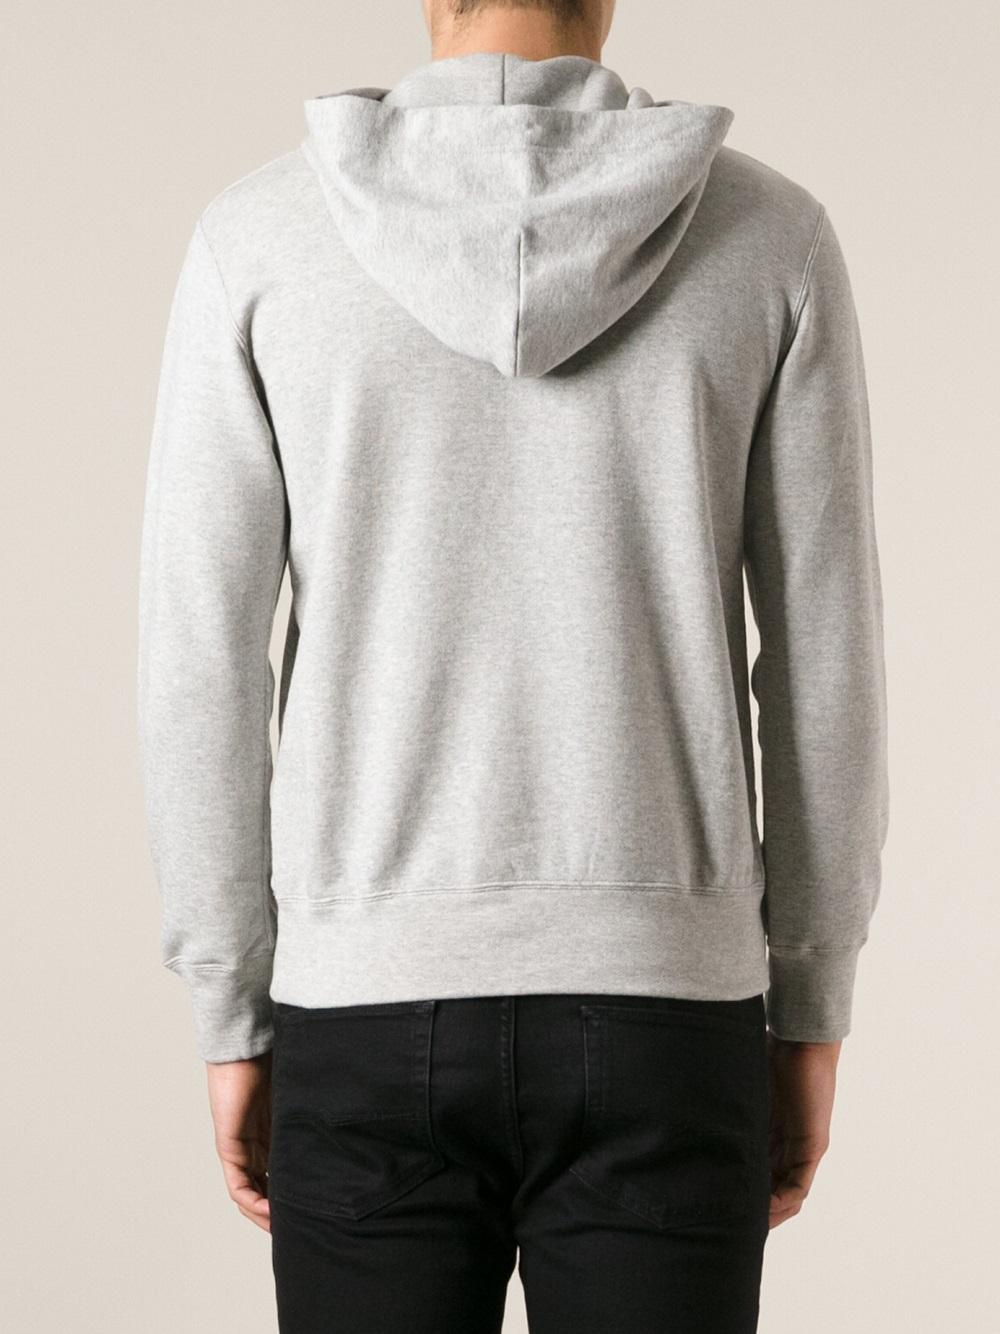 comme des gar ons heart logo hoodie in gray for men lyst. Black Bedroom Furniture Sets. Home Design Ideas